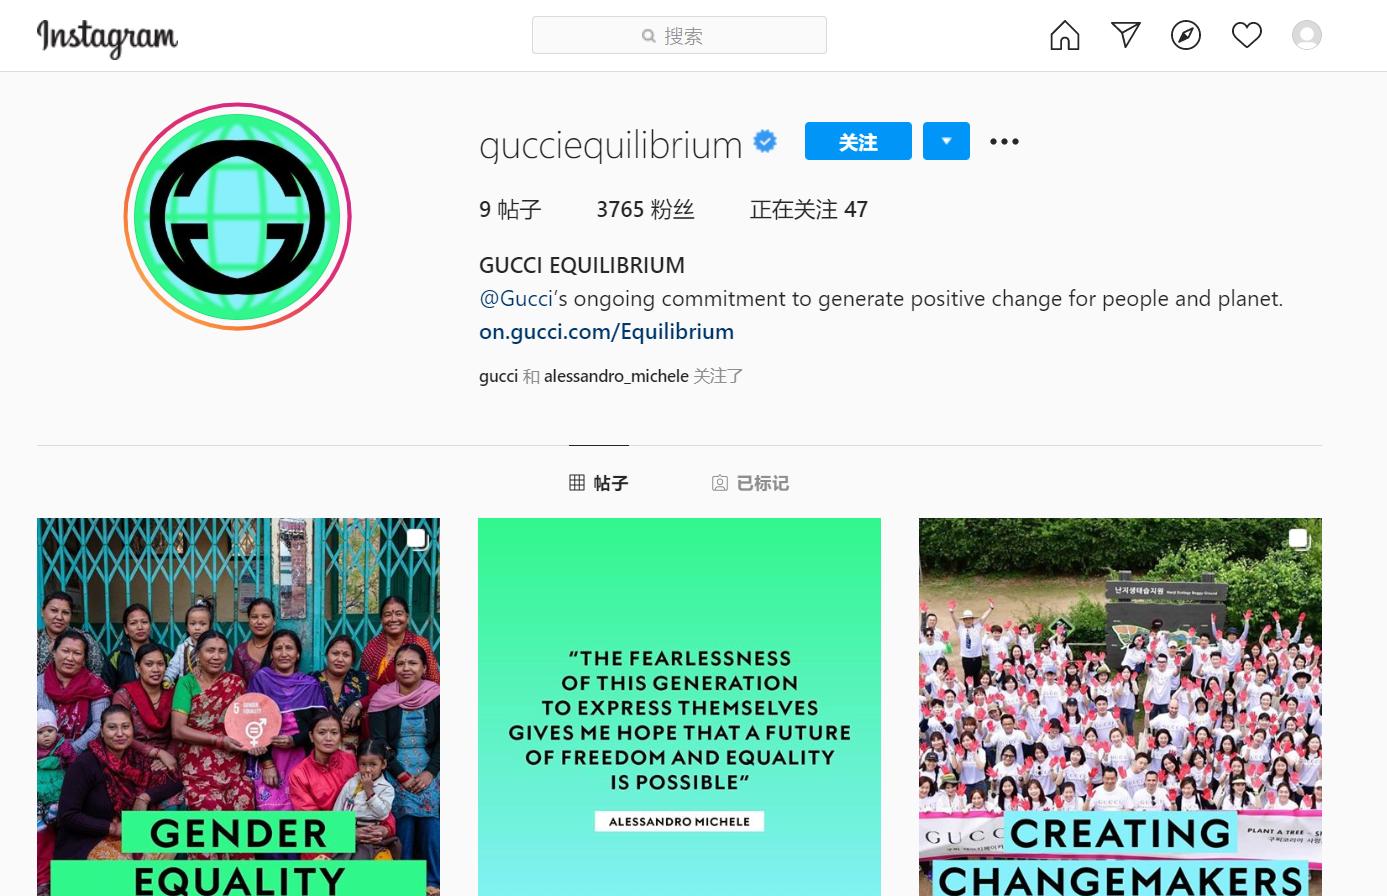 Gucci 在 Instagram 推出可持续时尚专属账号